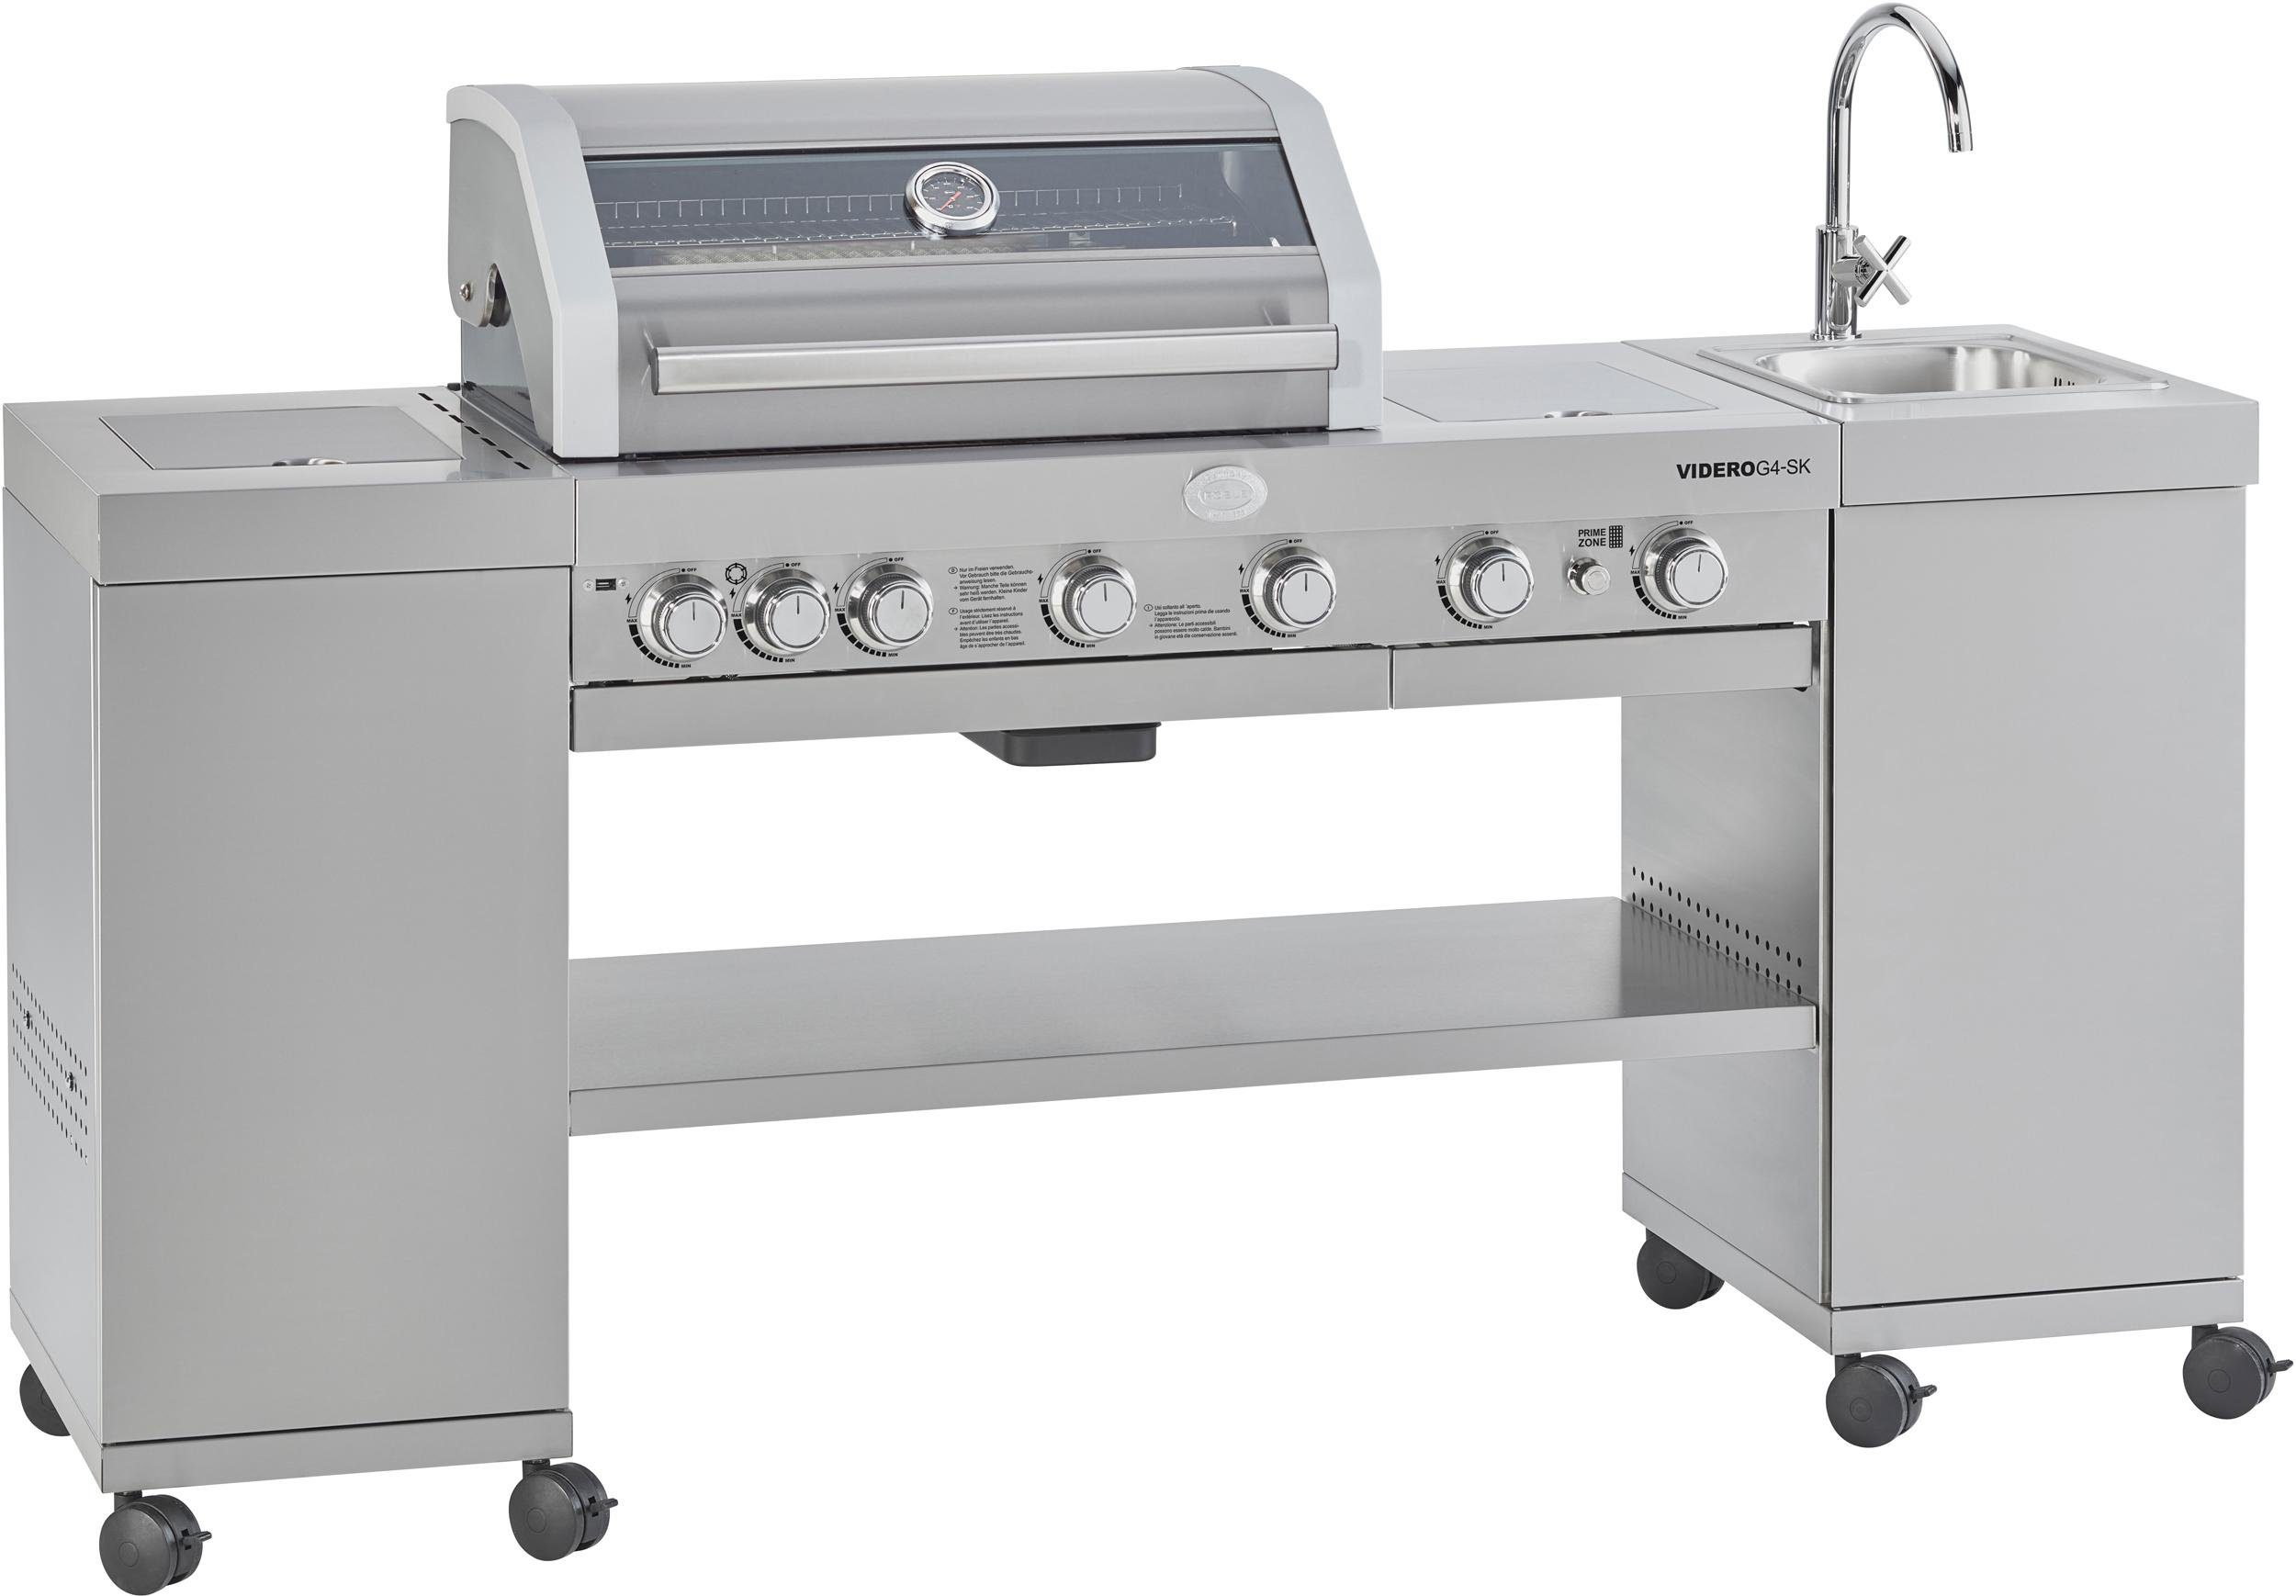 Enders Gasgrill Kansas 3 : Enders gasgrill zubehor romanticist heavy duty grill aluminium